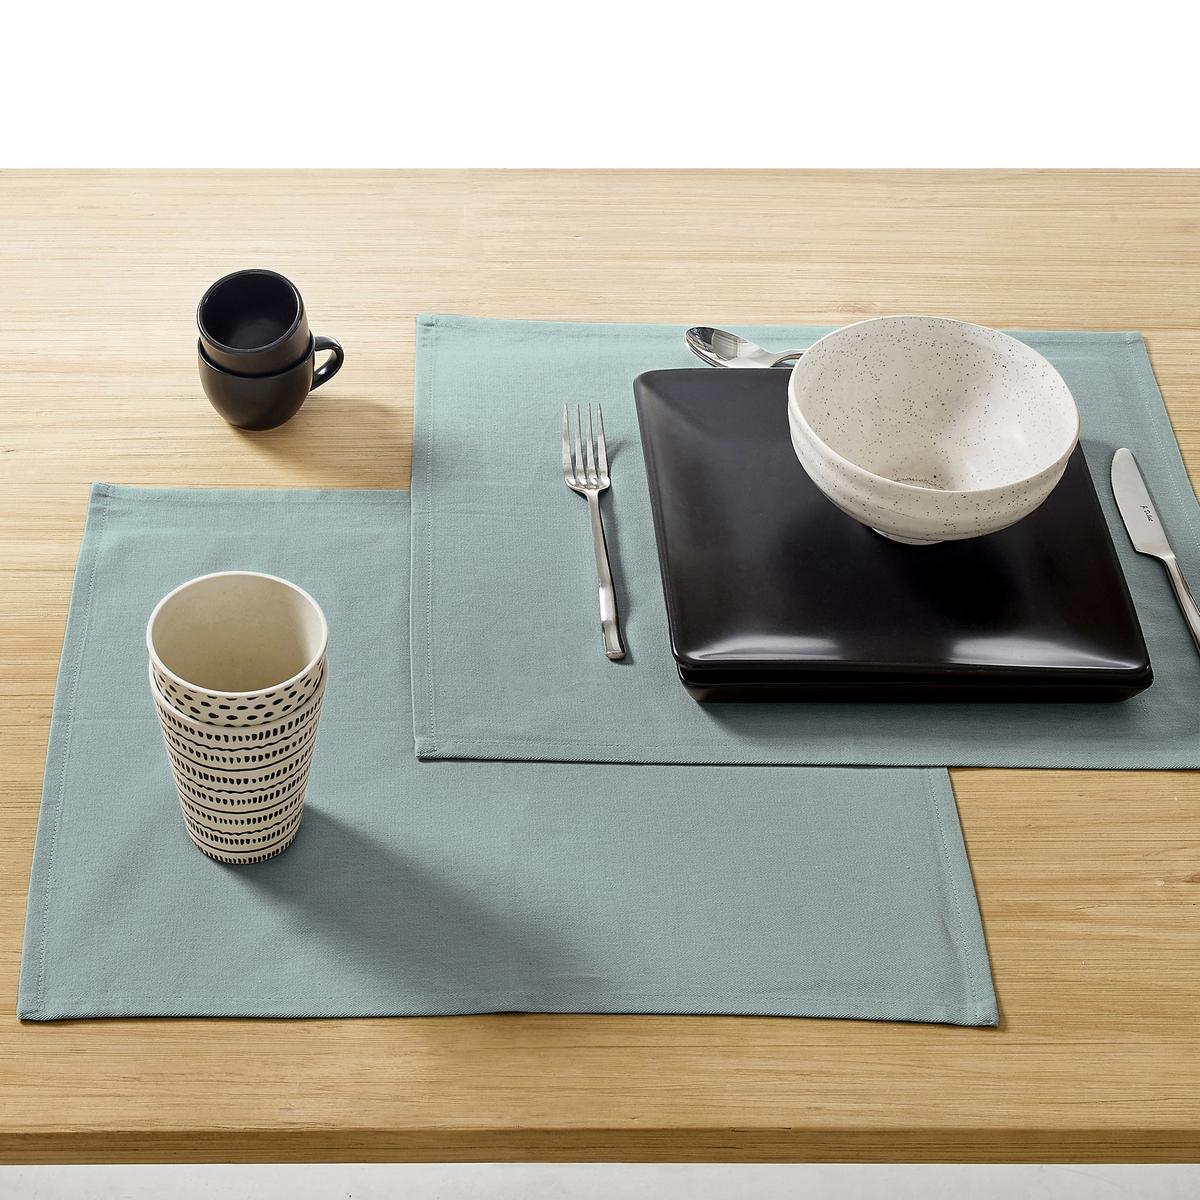 Комплект из 4 салфеток под столовый прибор, с обработкой против пятен от La Redoute